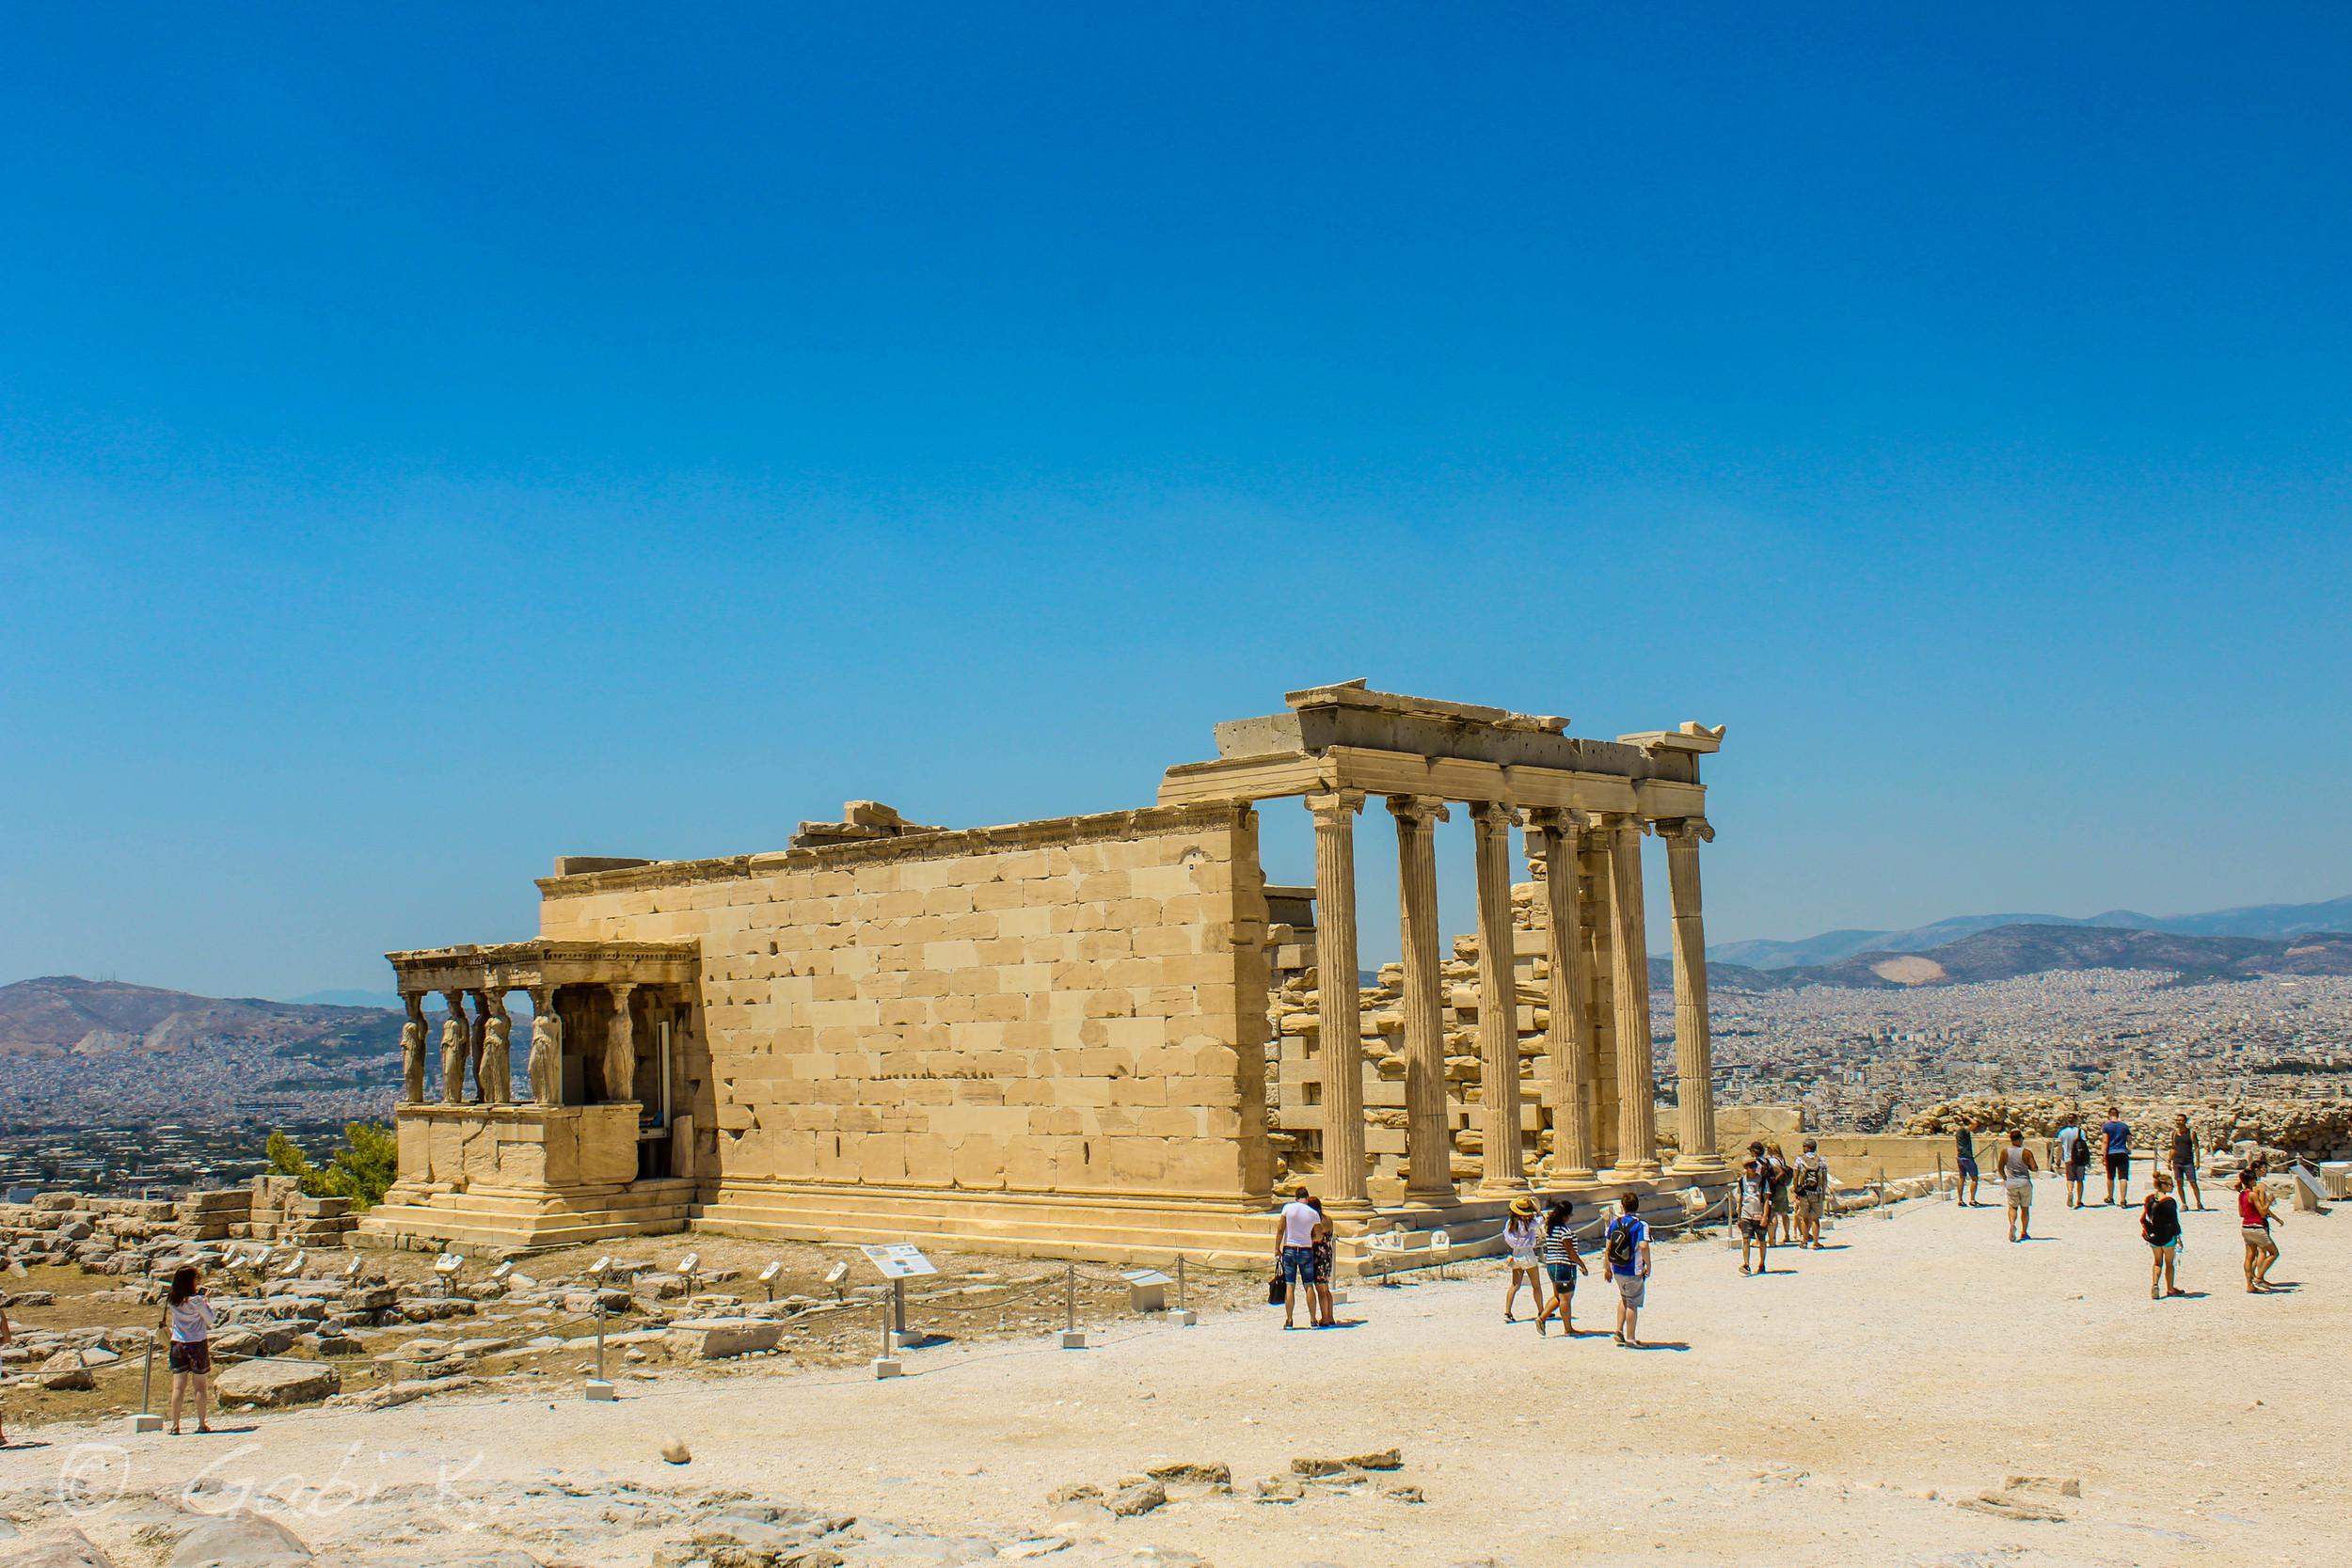 Erechtheum - a temple dedicated to both Athena and Poseidon